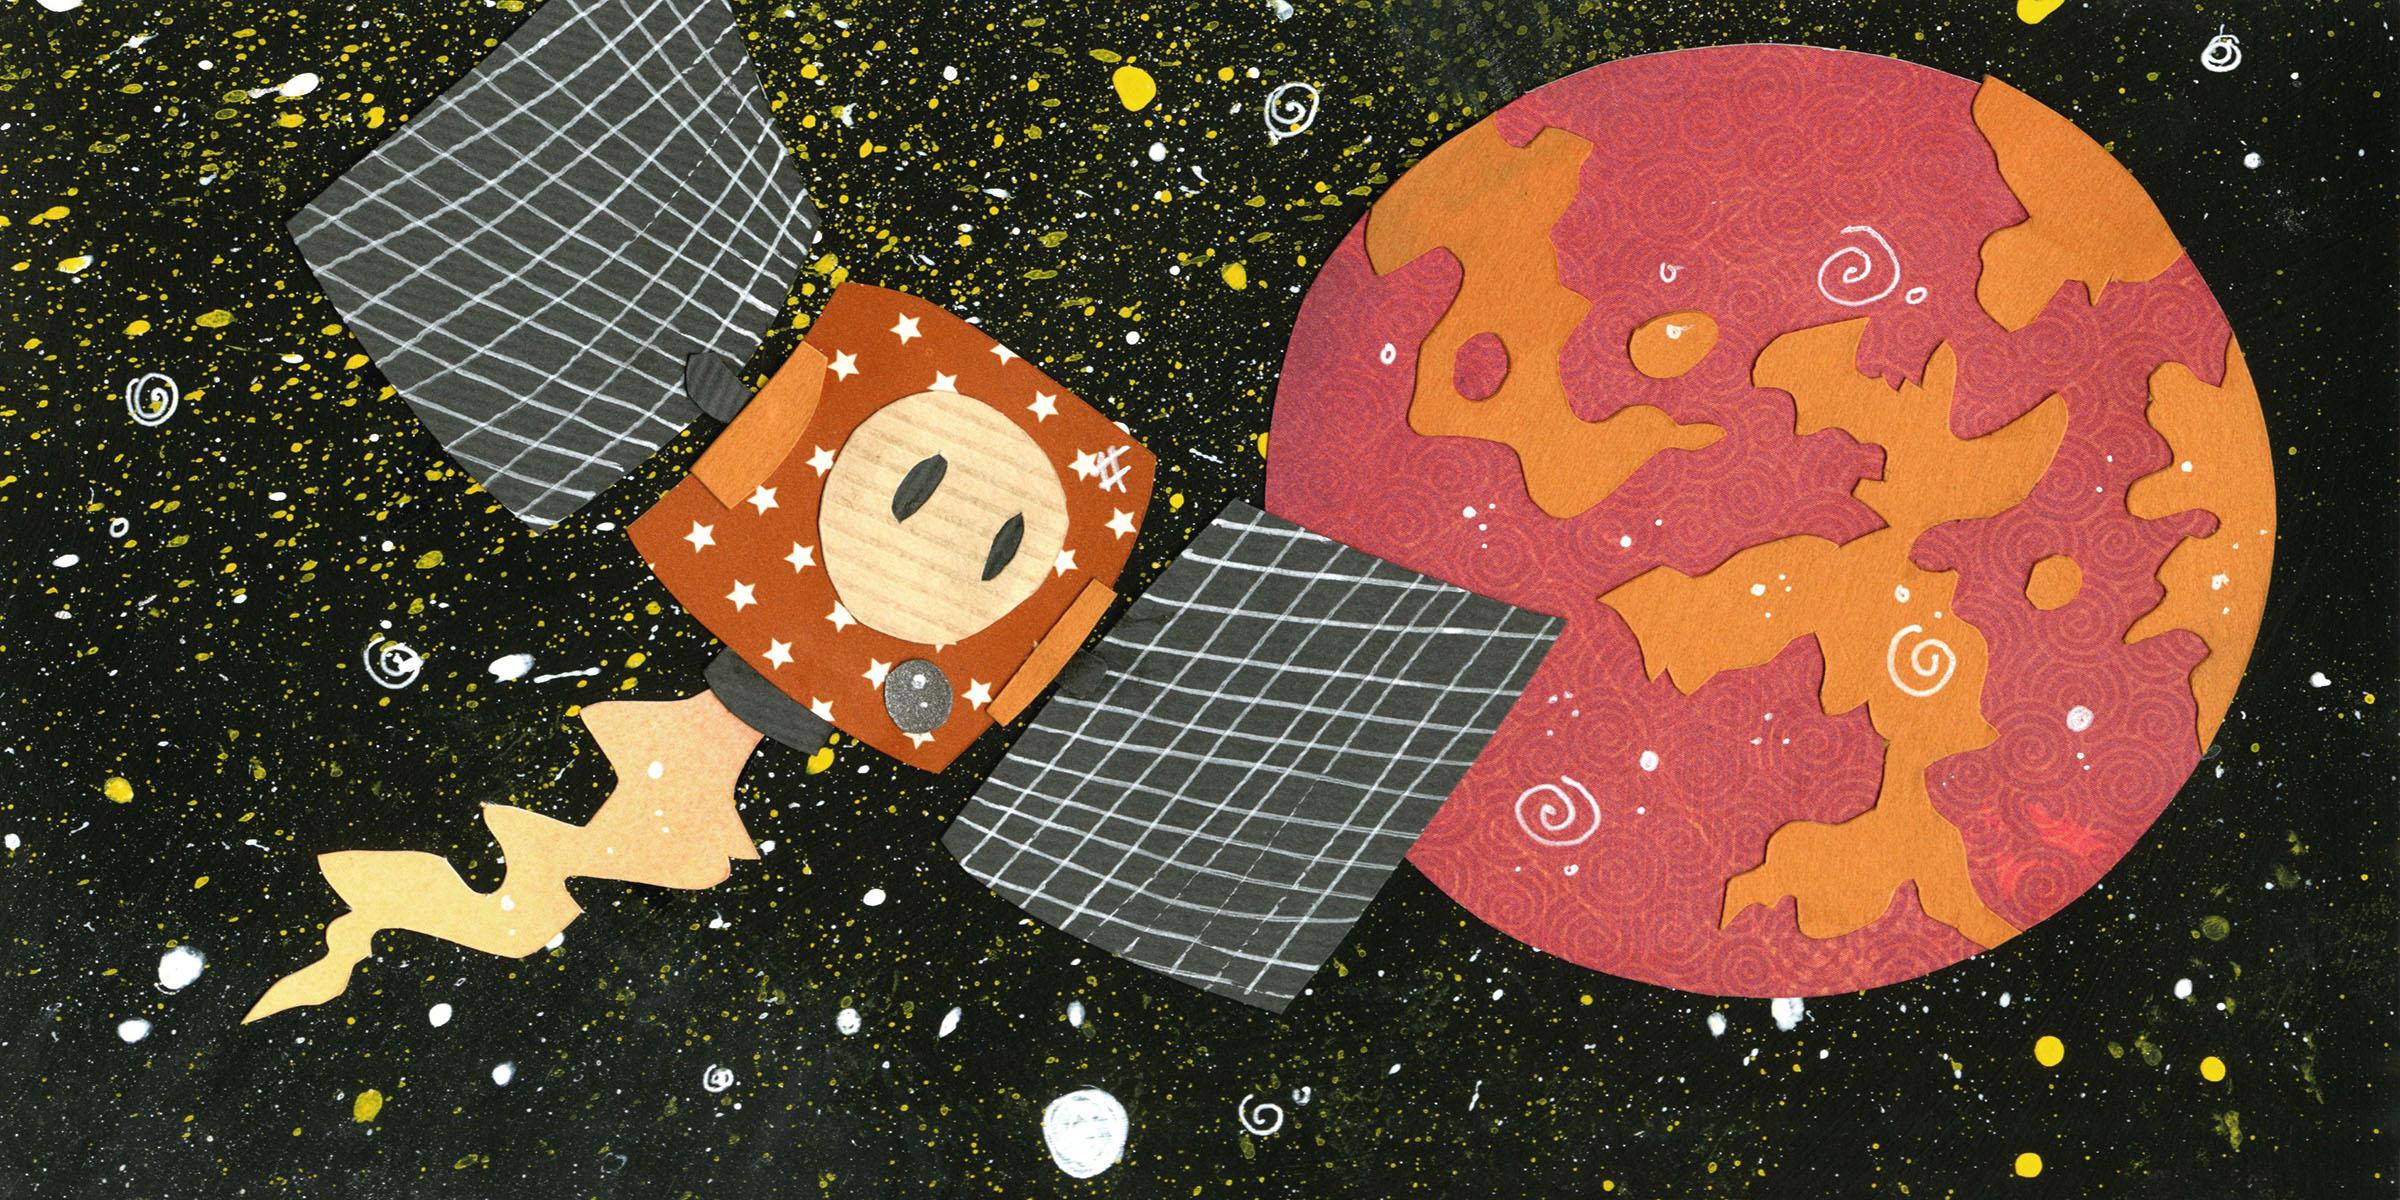 akatsuki spacecraft. paper-cut illustration.